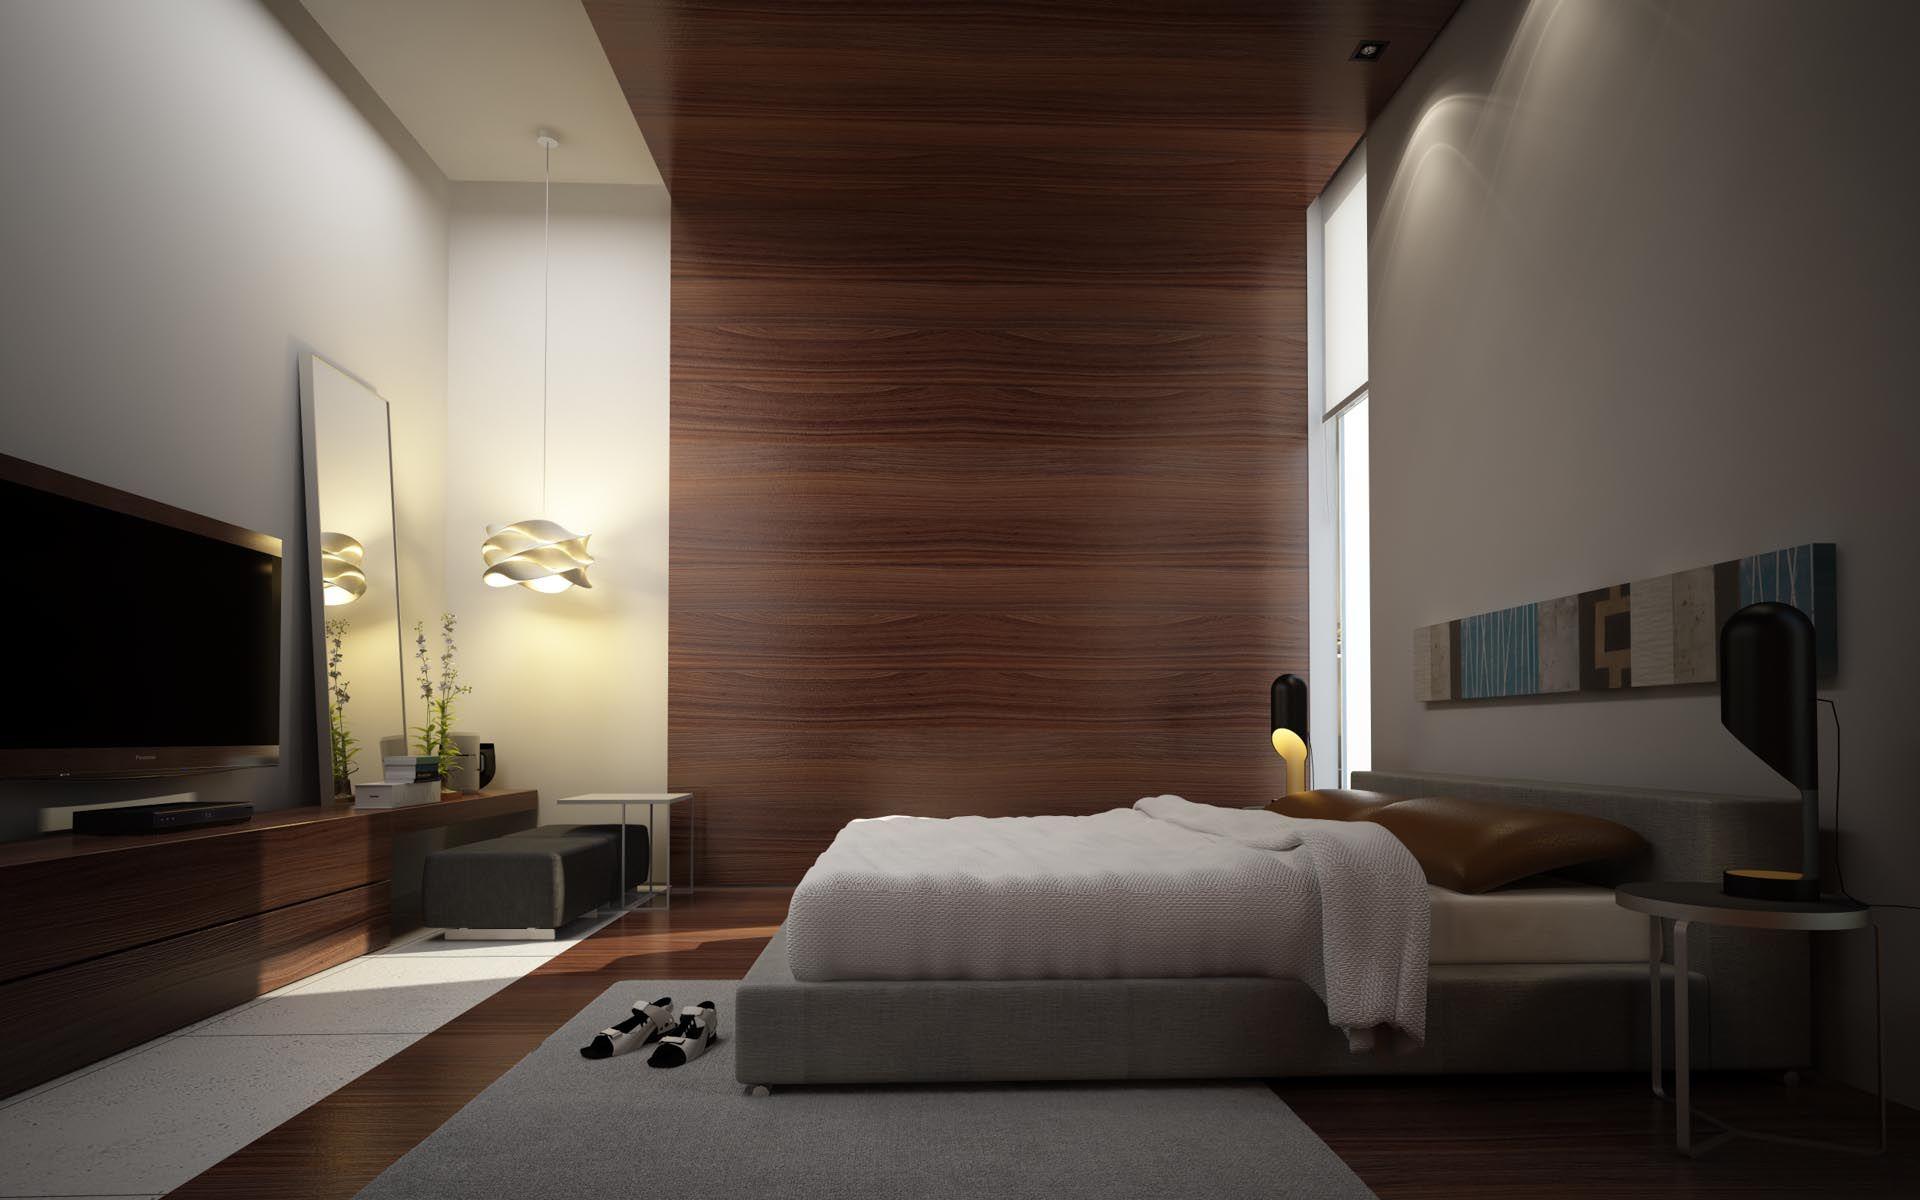 Loves this bedroom interiores for Kasa diseno interior